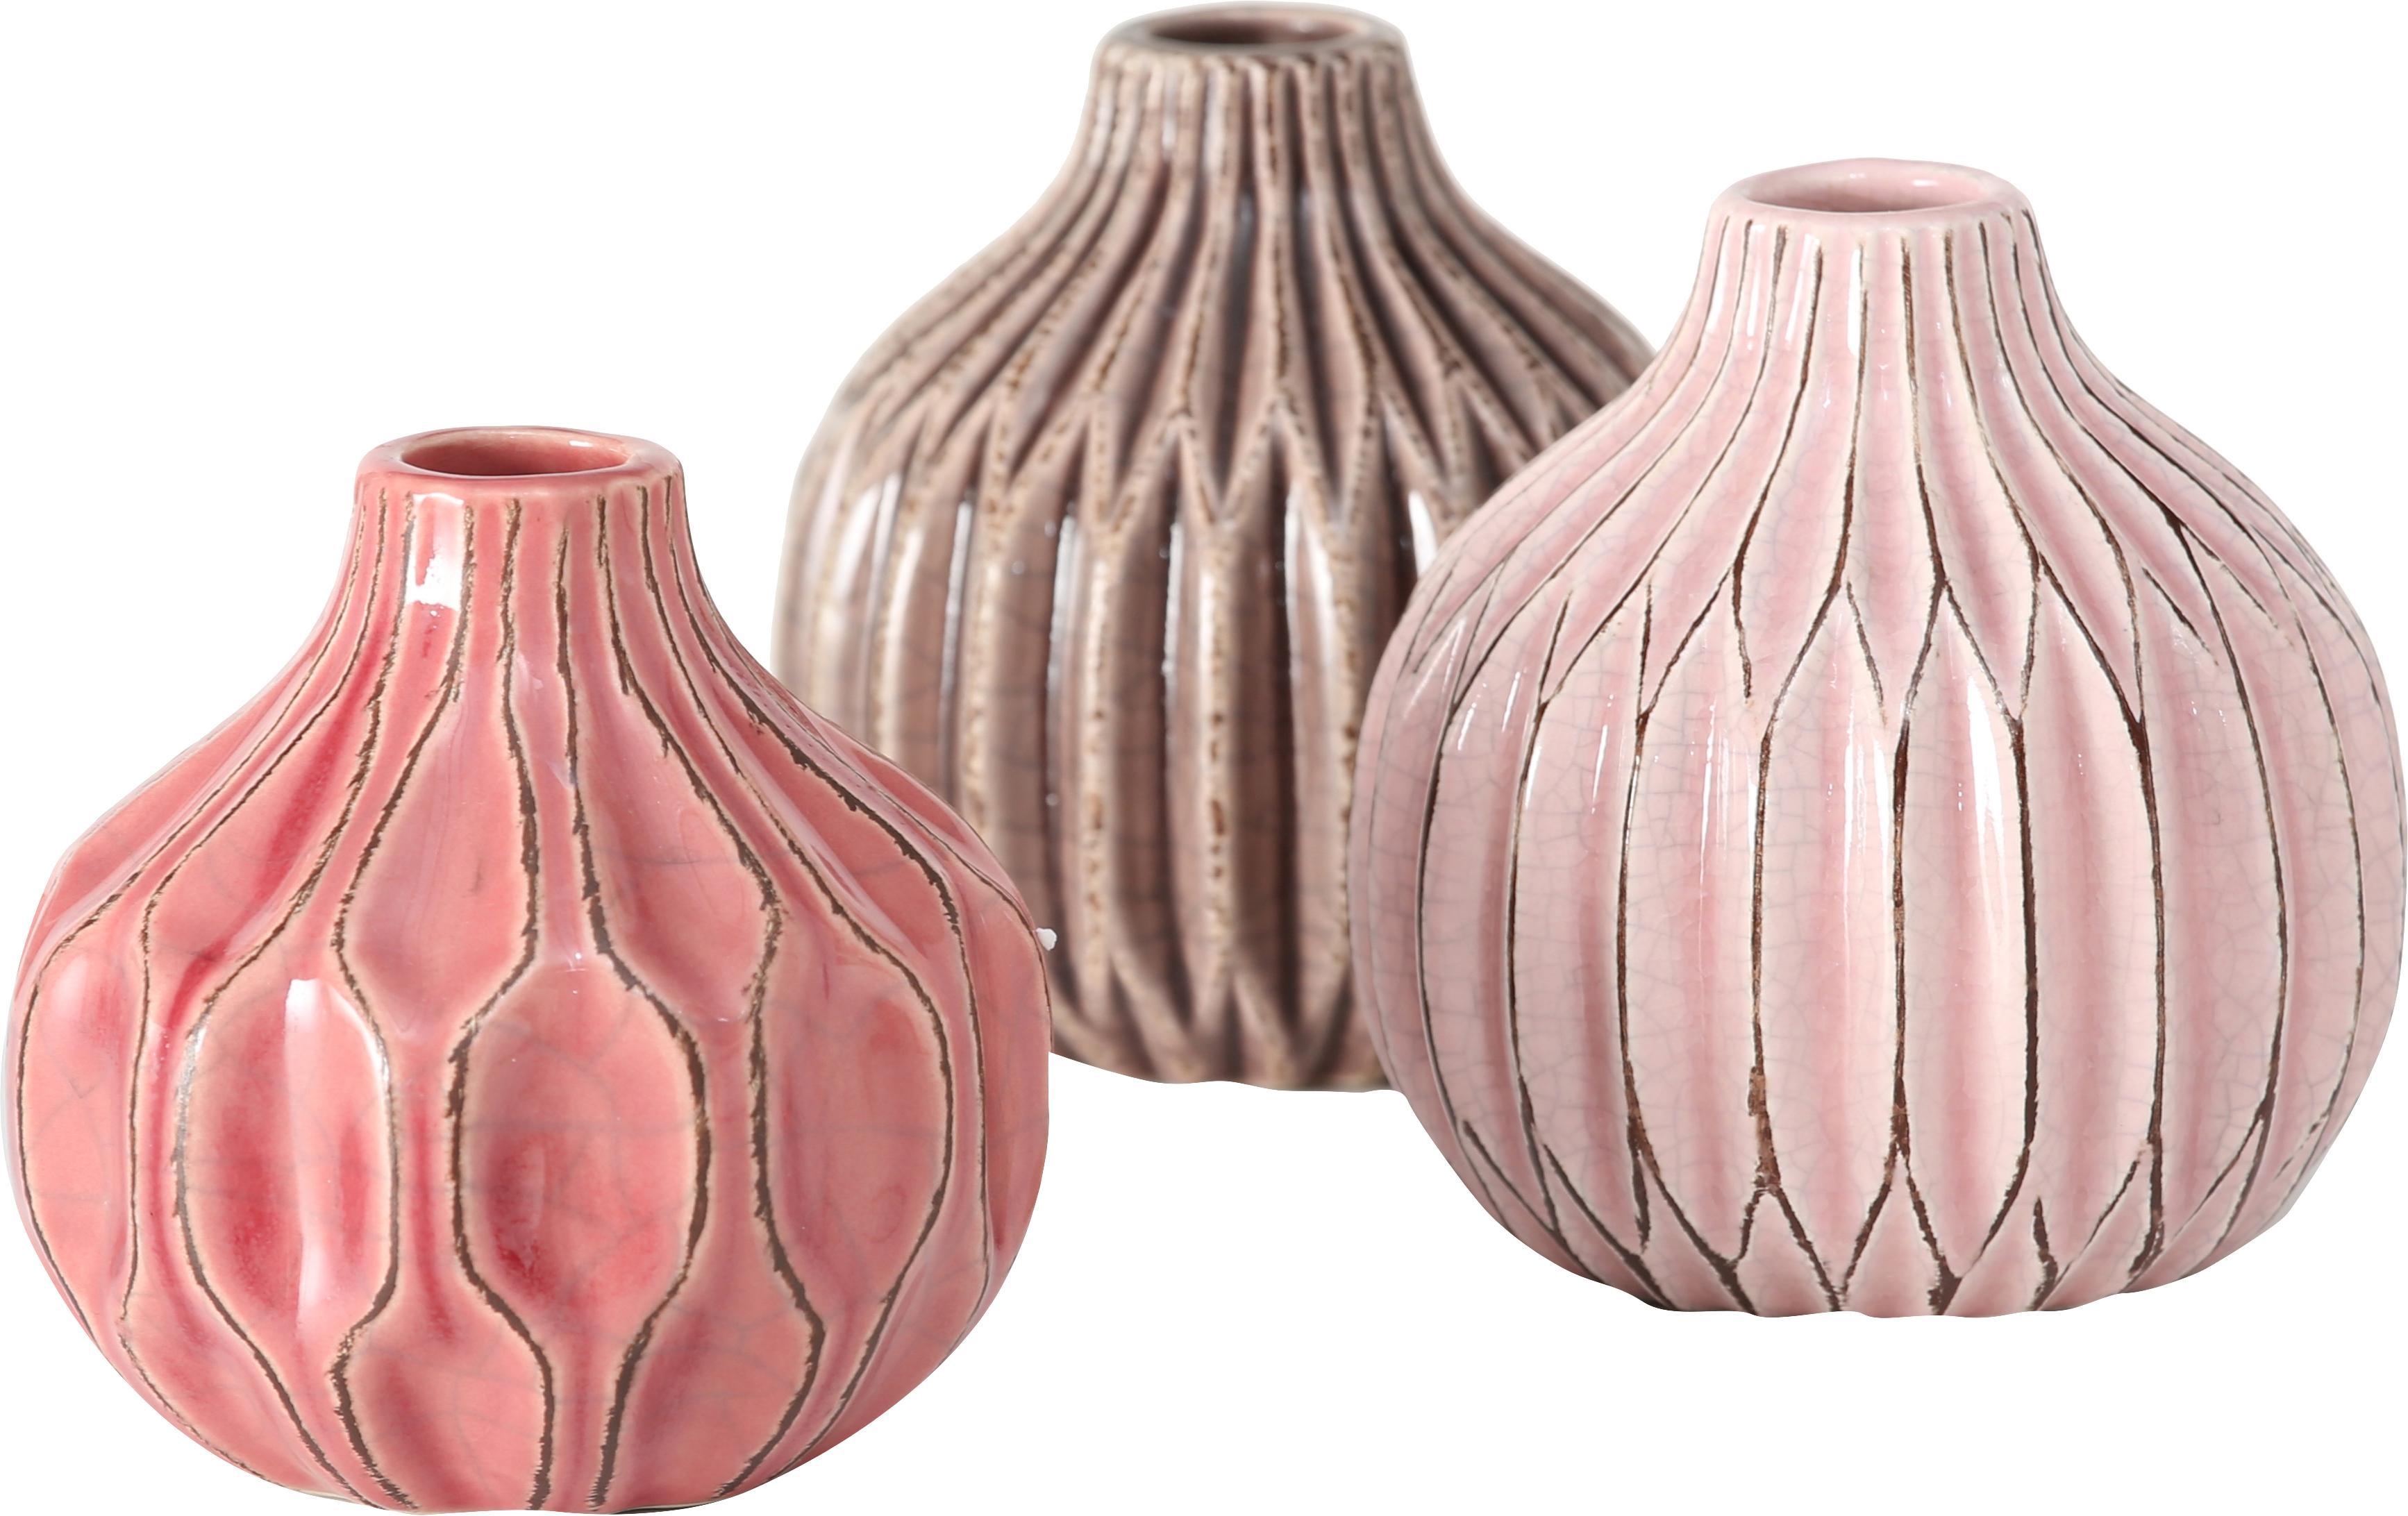 Set 3 vasi in terracotta Lenja, Terracotta, Rosa, corallo, marrone, Ø 11 x Alt. 11 cm